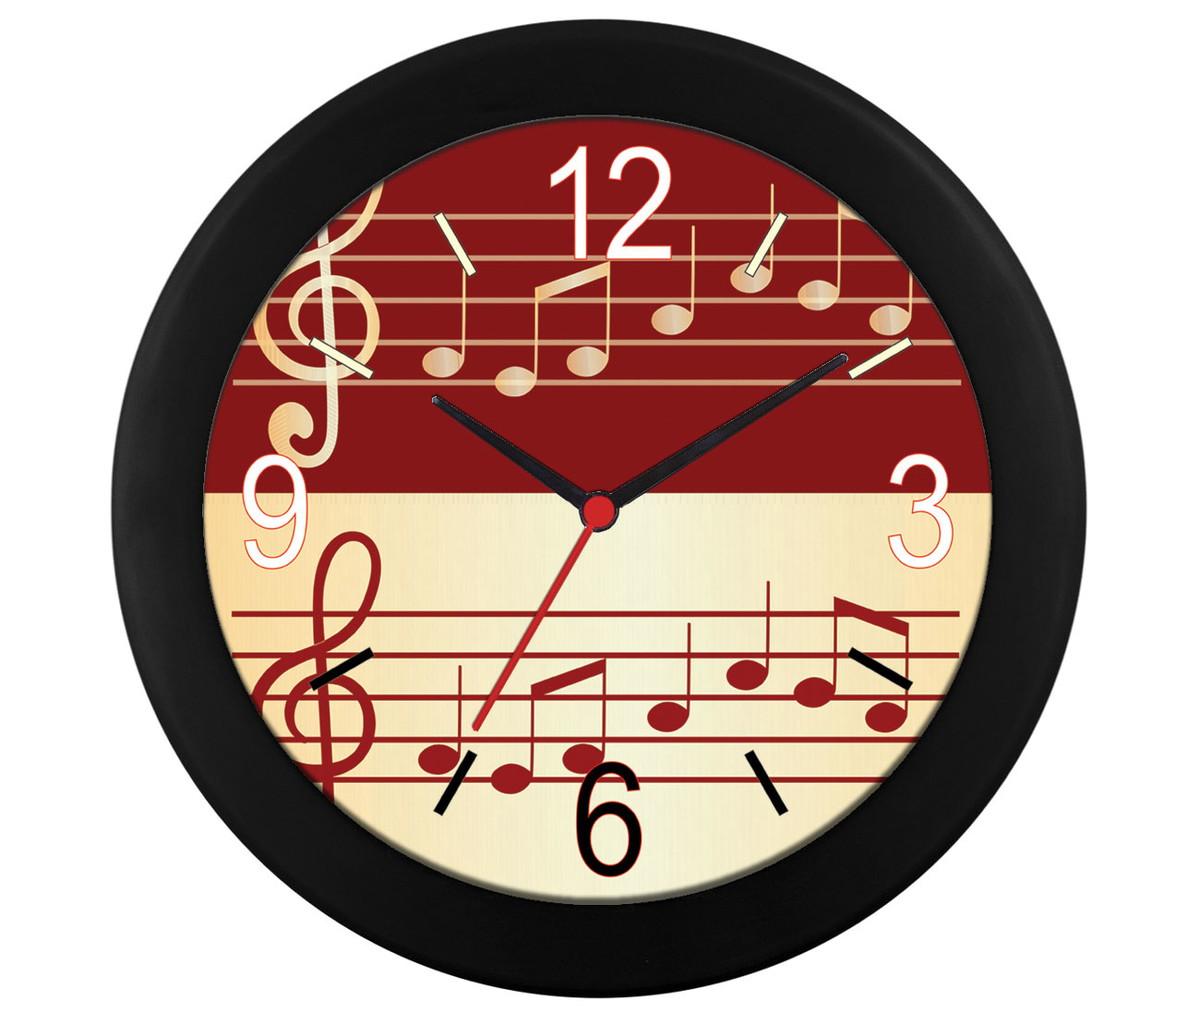 d45662a69e2 Relógio de parede Pauta musical no Elo7